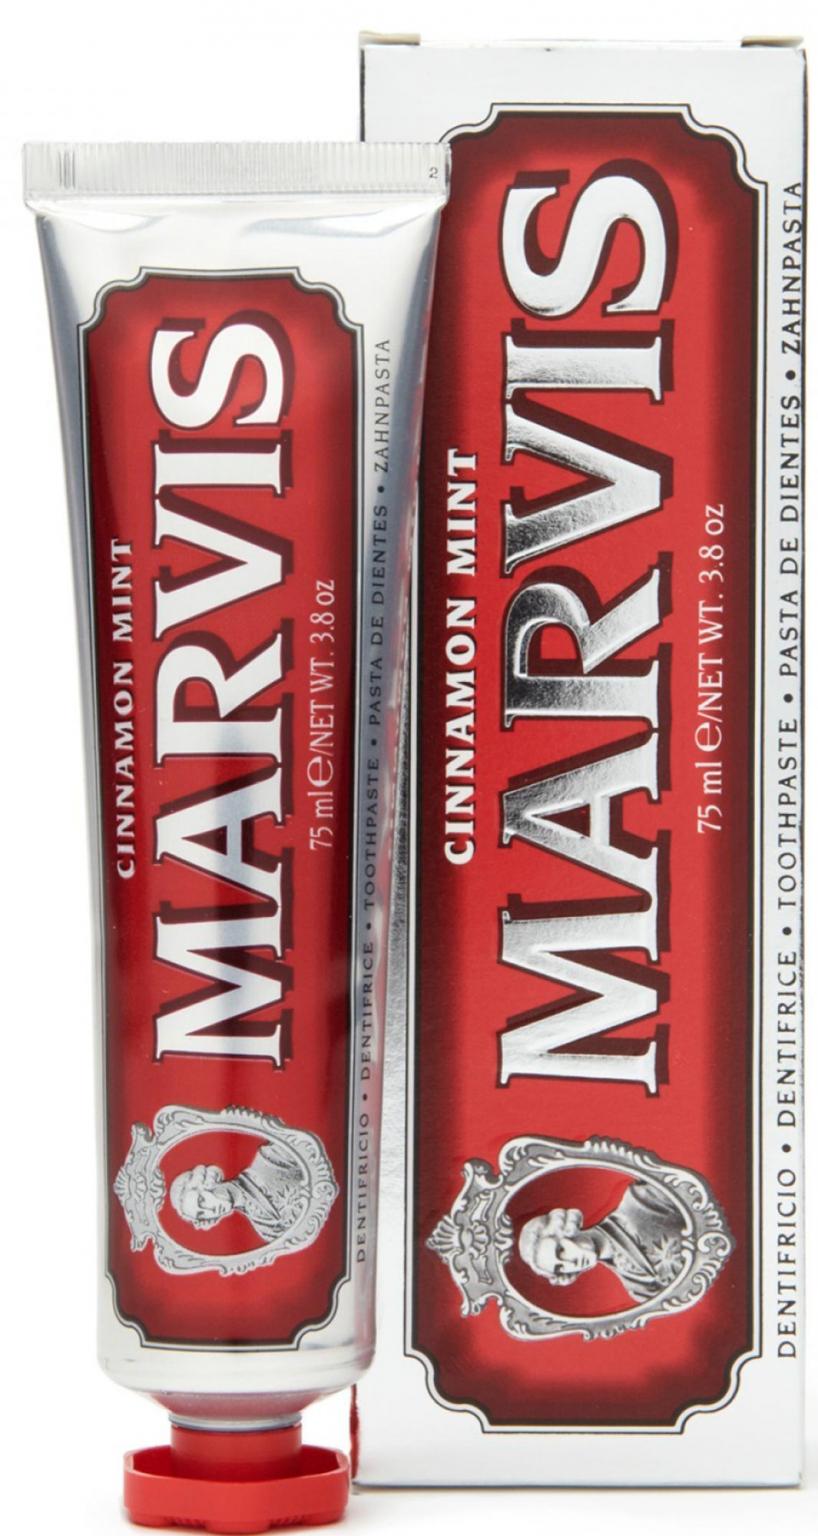 Зубная паста Marvis Cinnamon Mint Корица и мята 85 мл